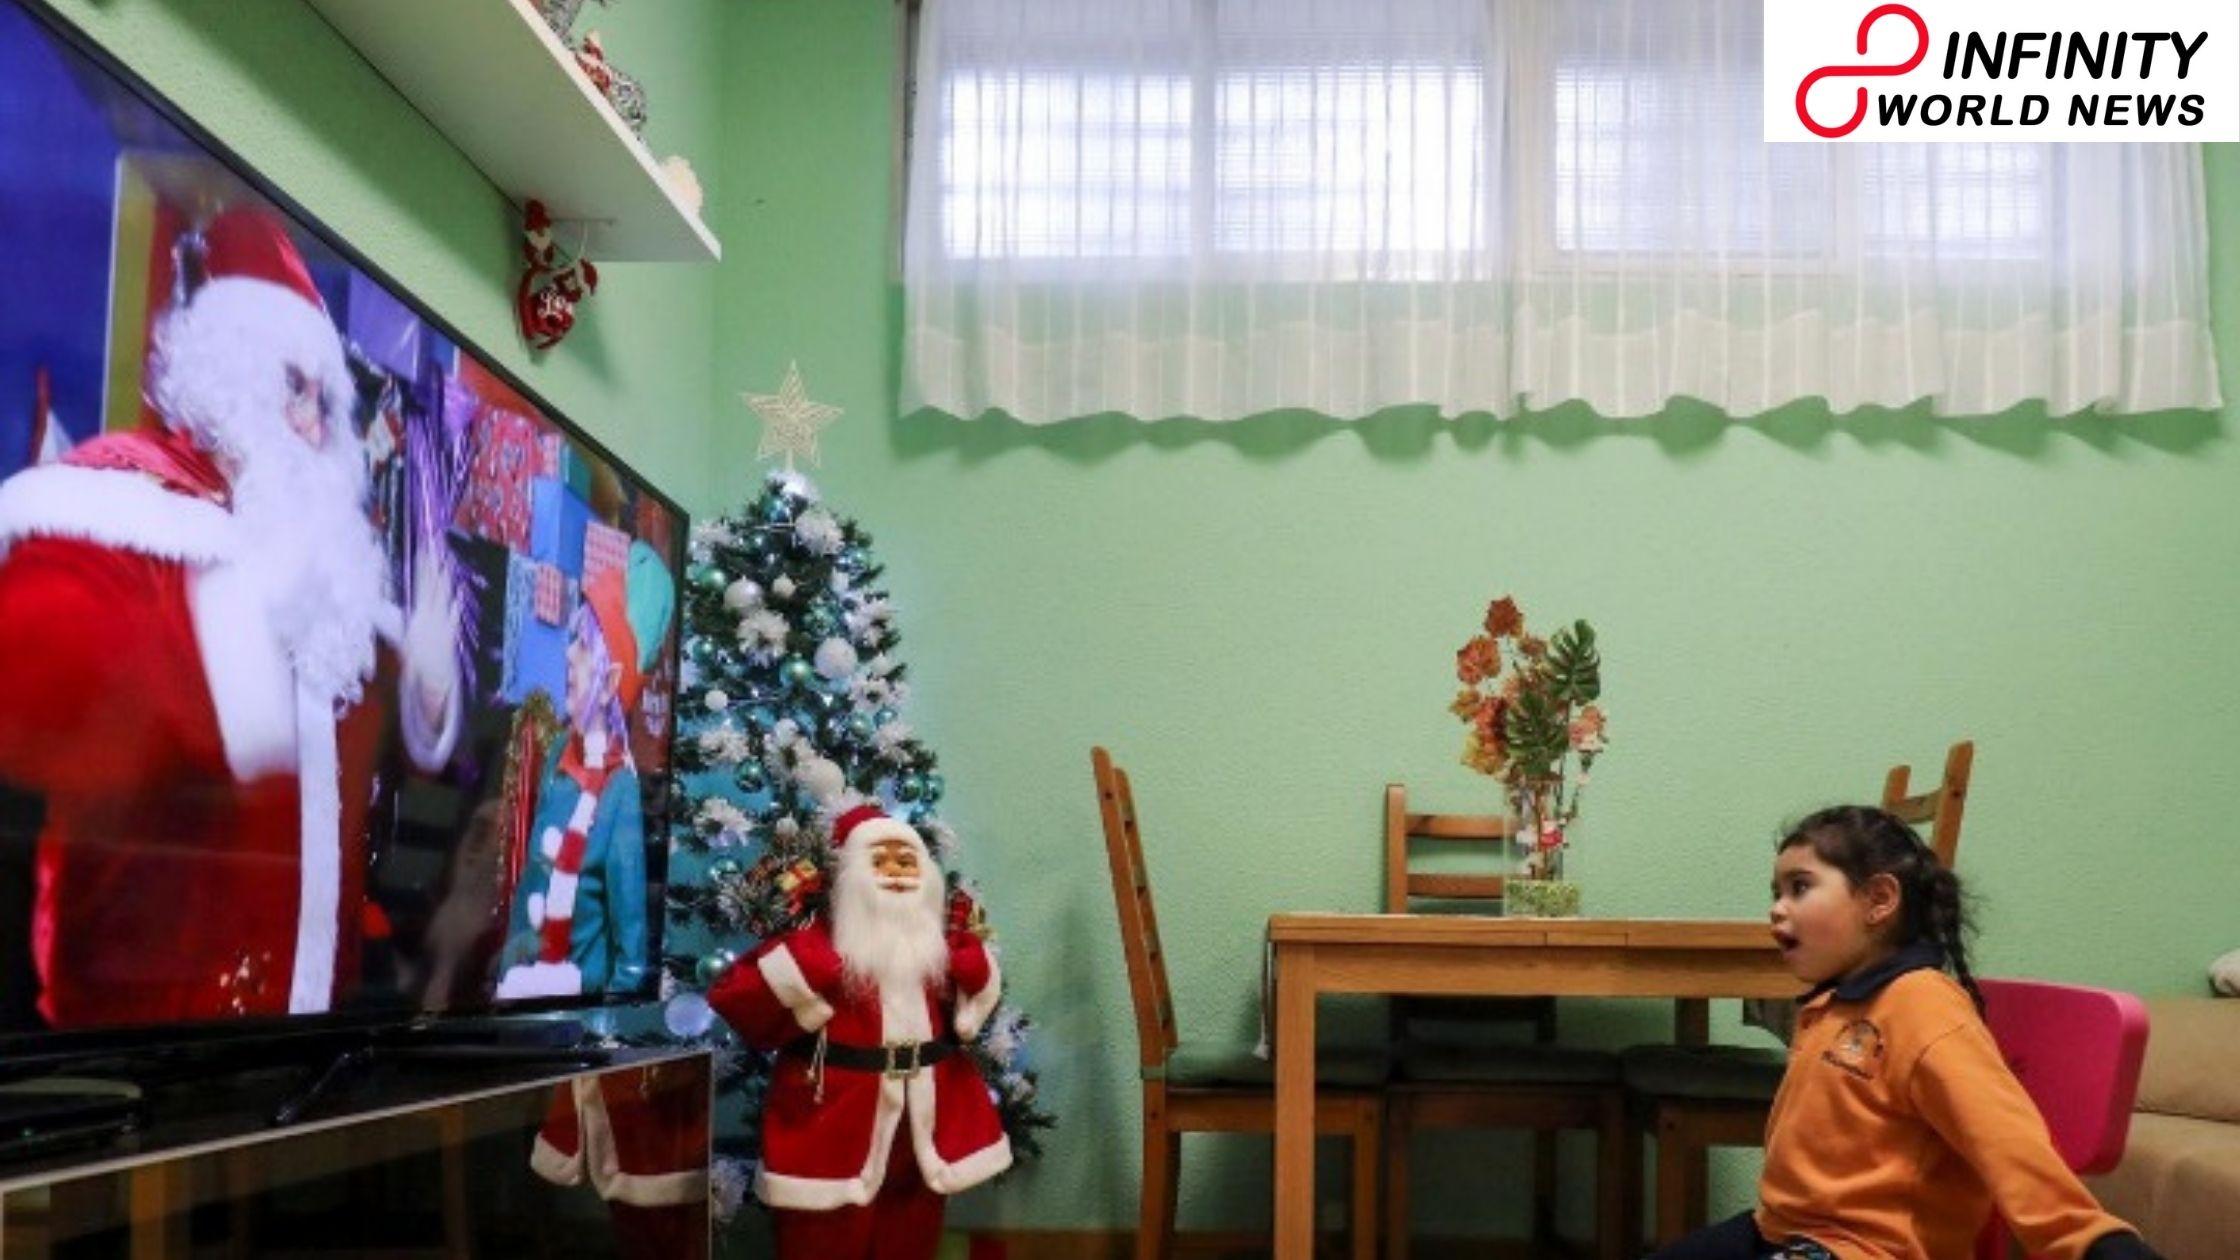 Virtual Santa Goes Viral because of Pandemic in Spain